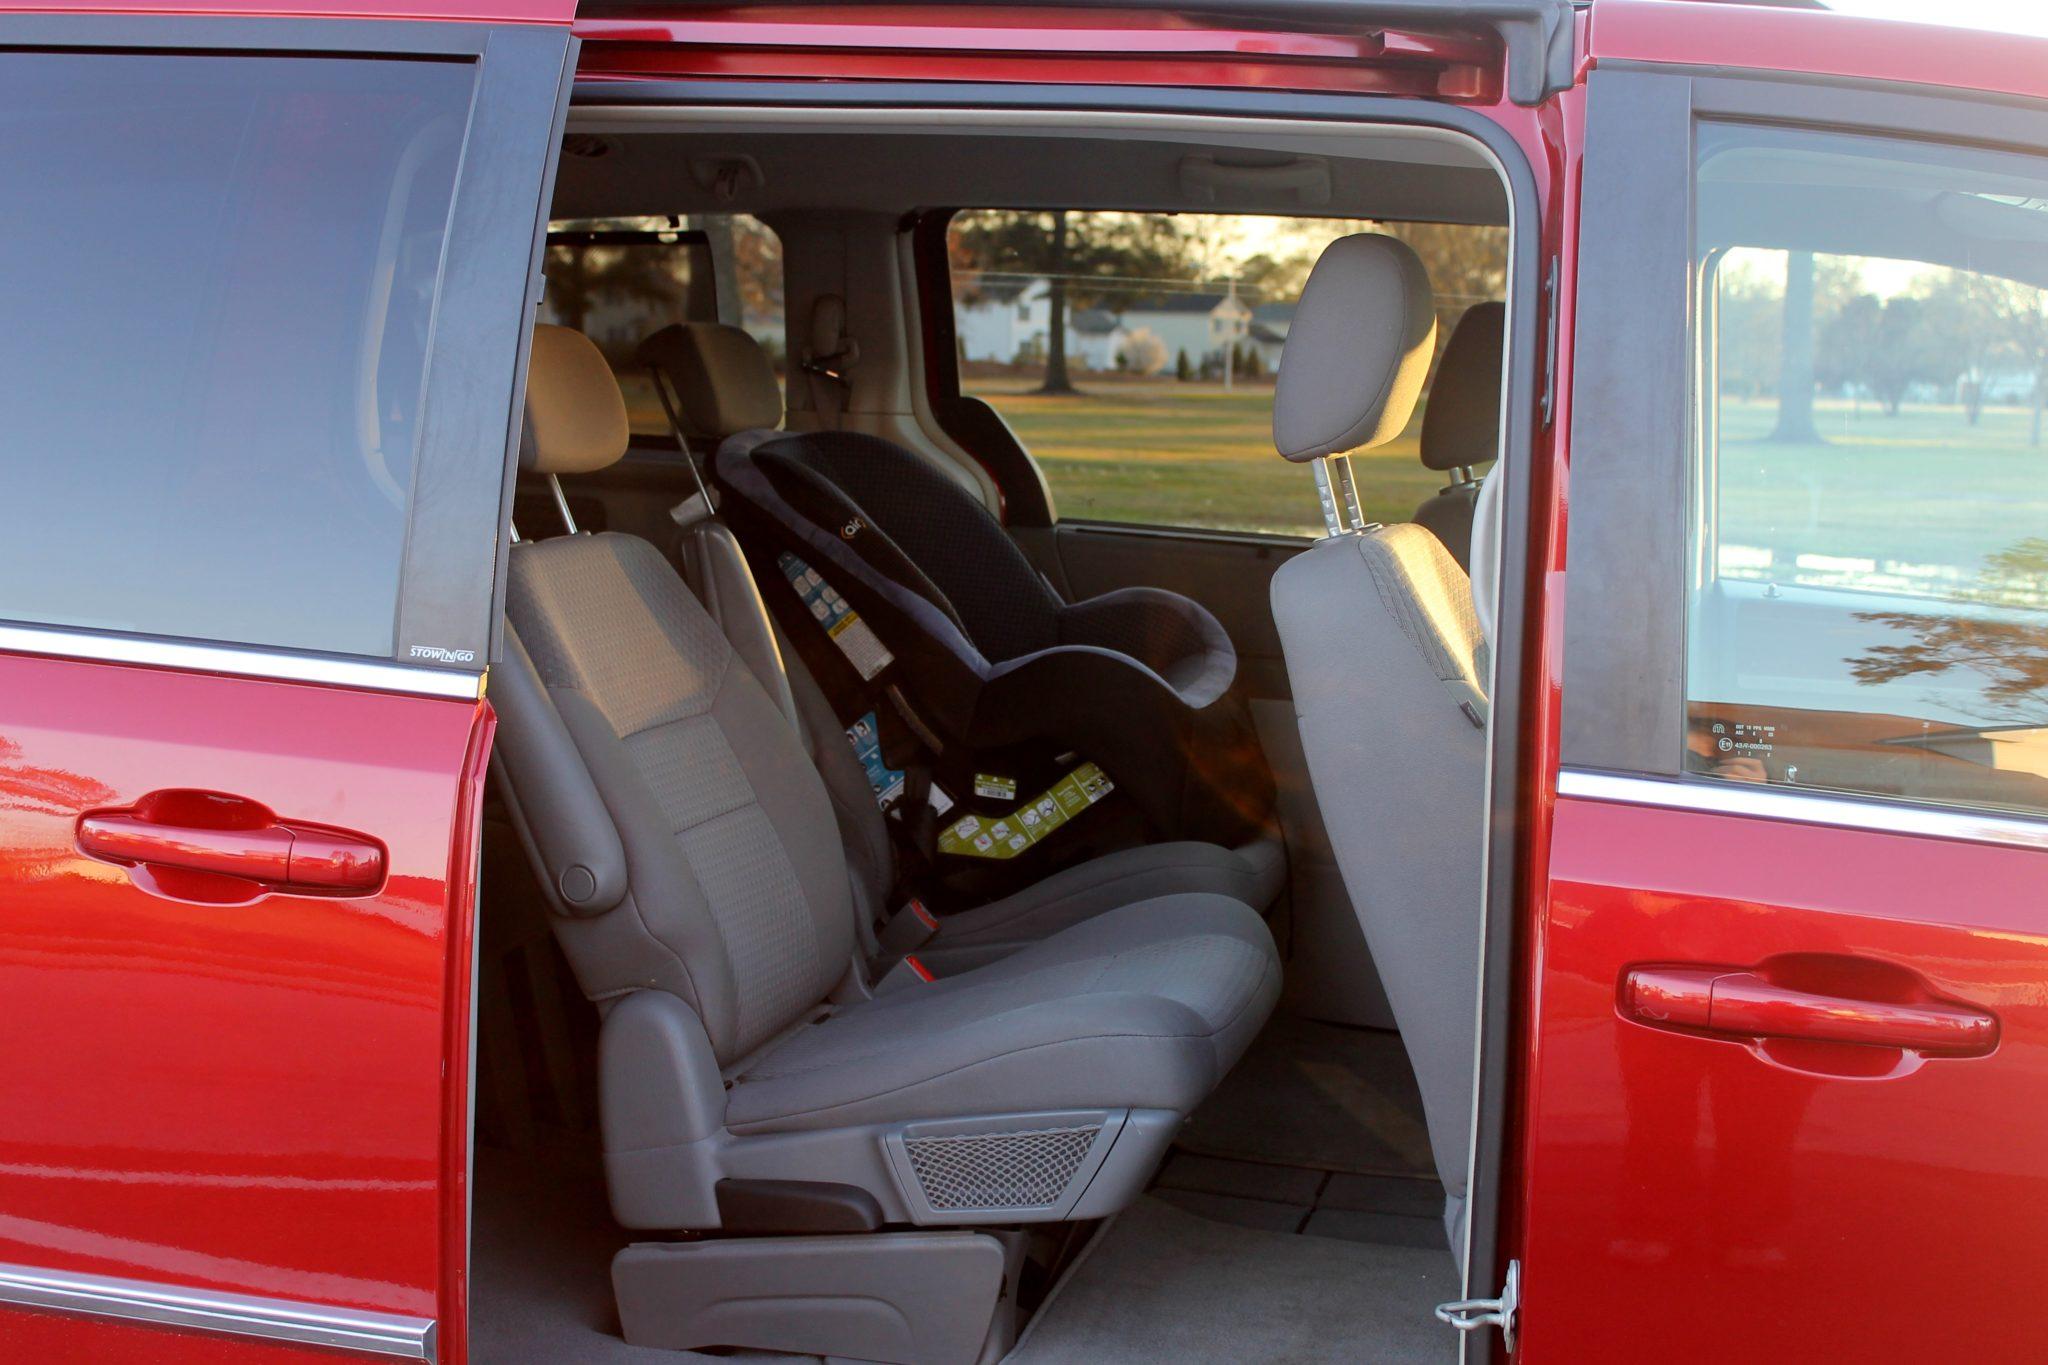 Bigger vehicle minivan pregnancy announcement idea